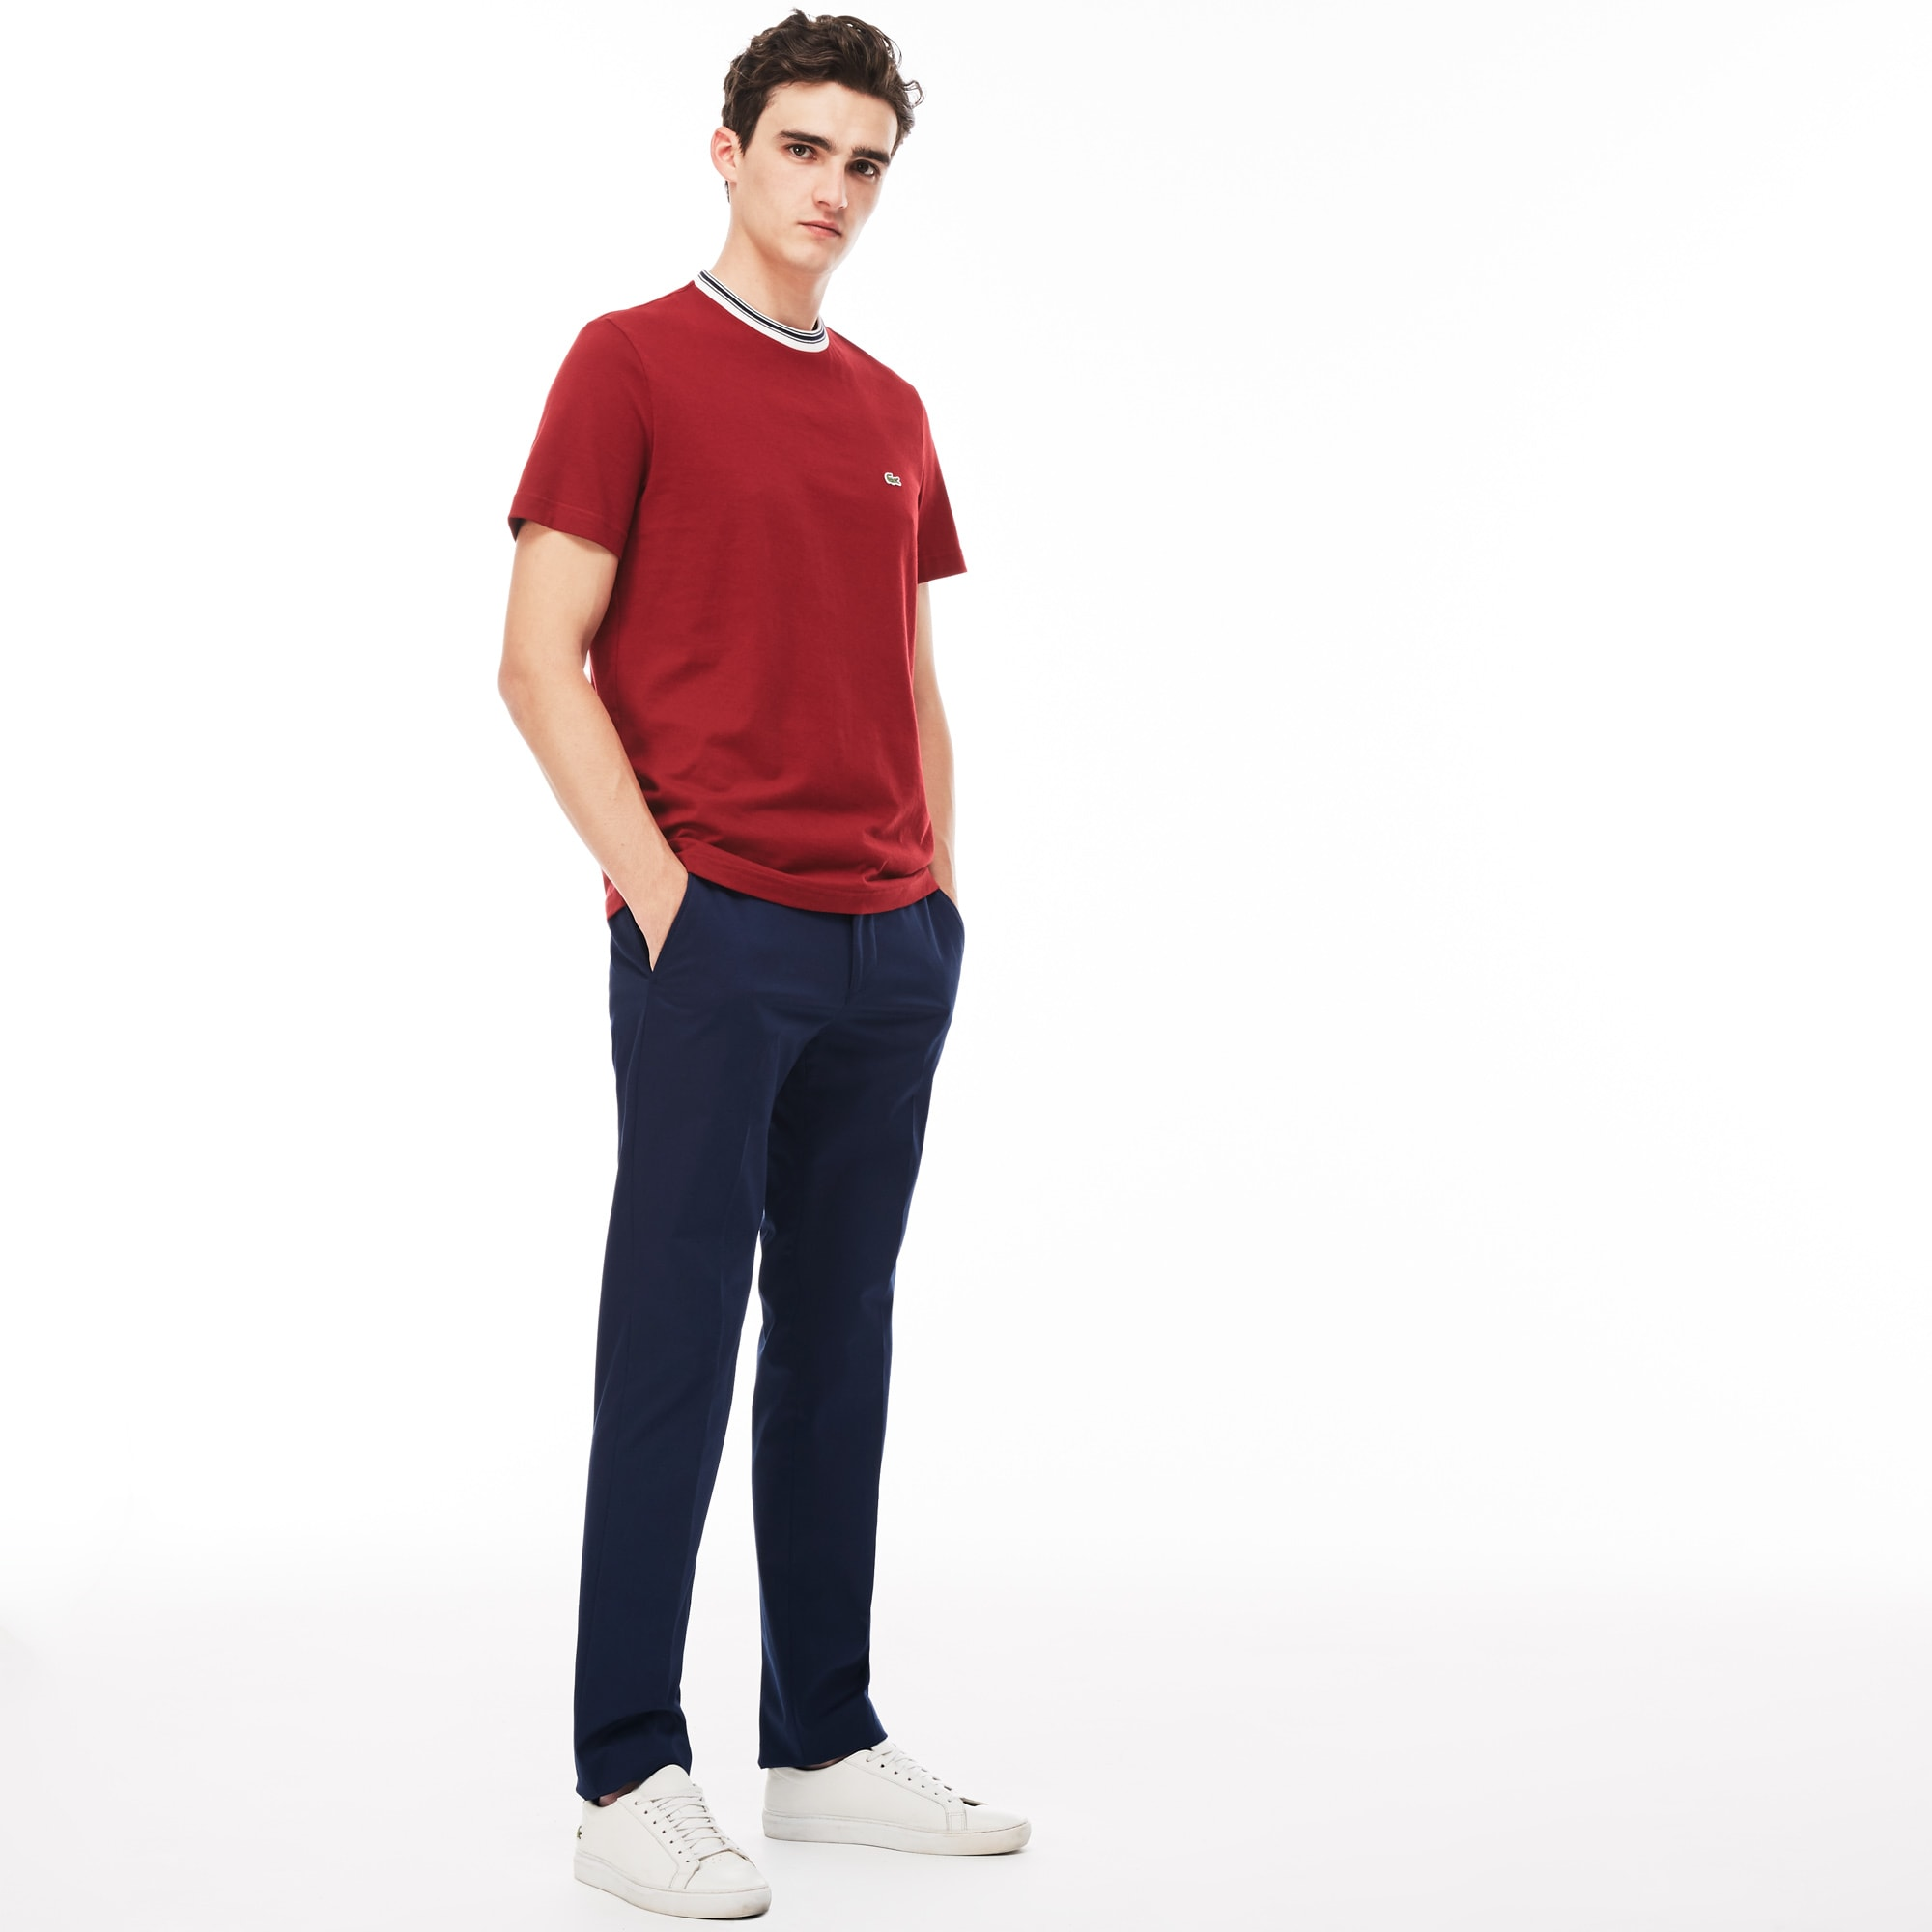 Pantaloni chino slim fit con pince in gabardine tinta unita